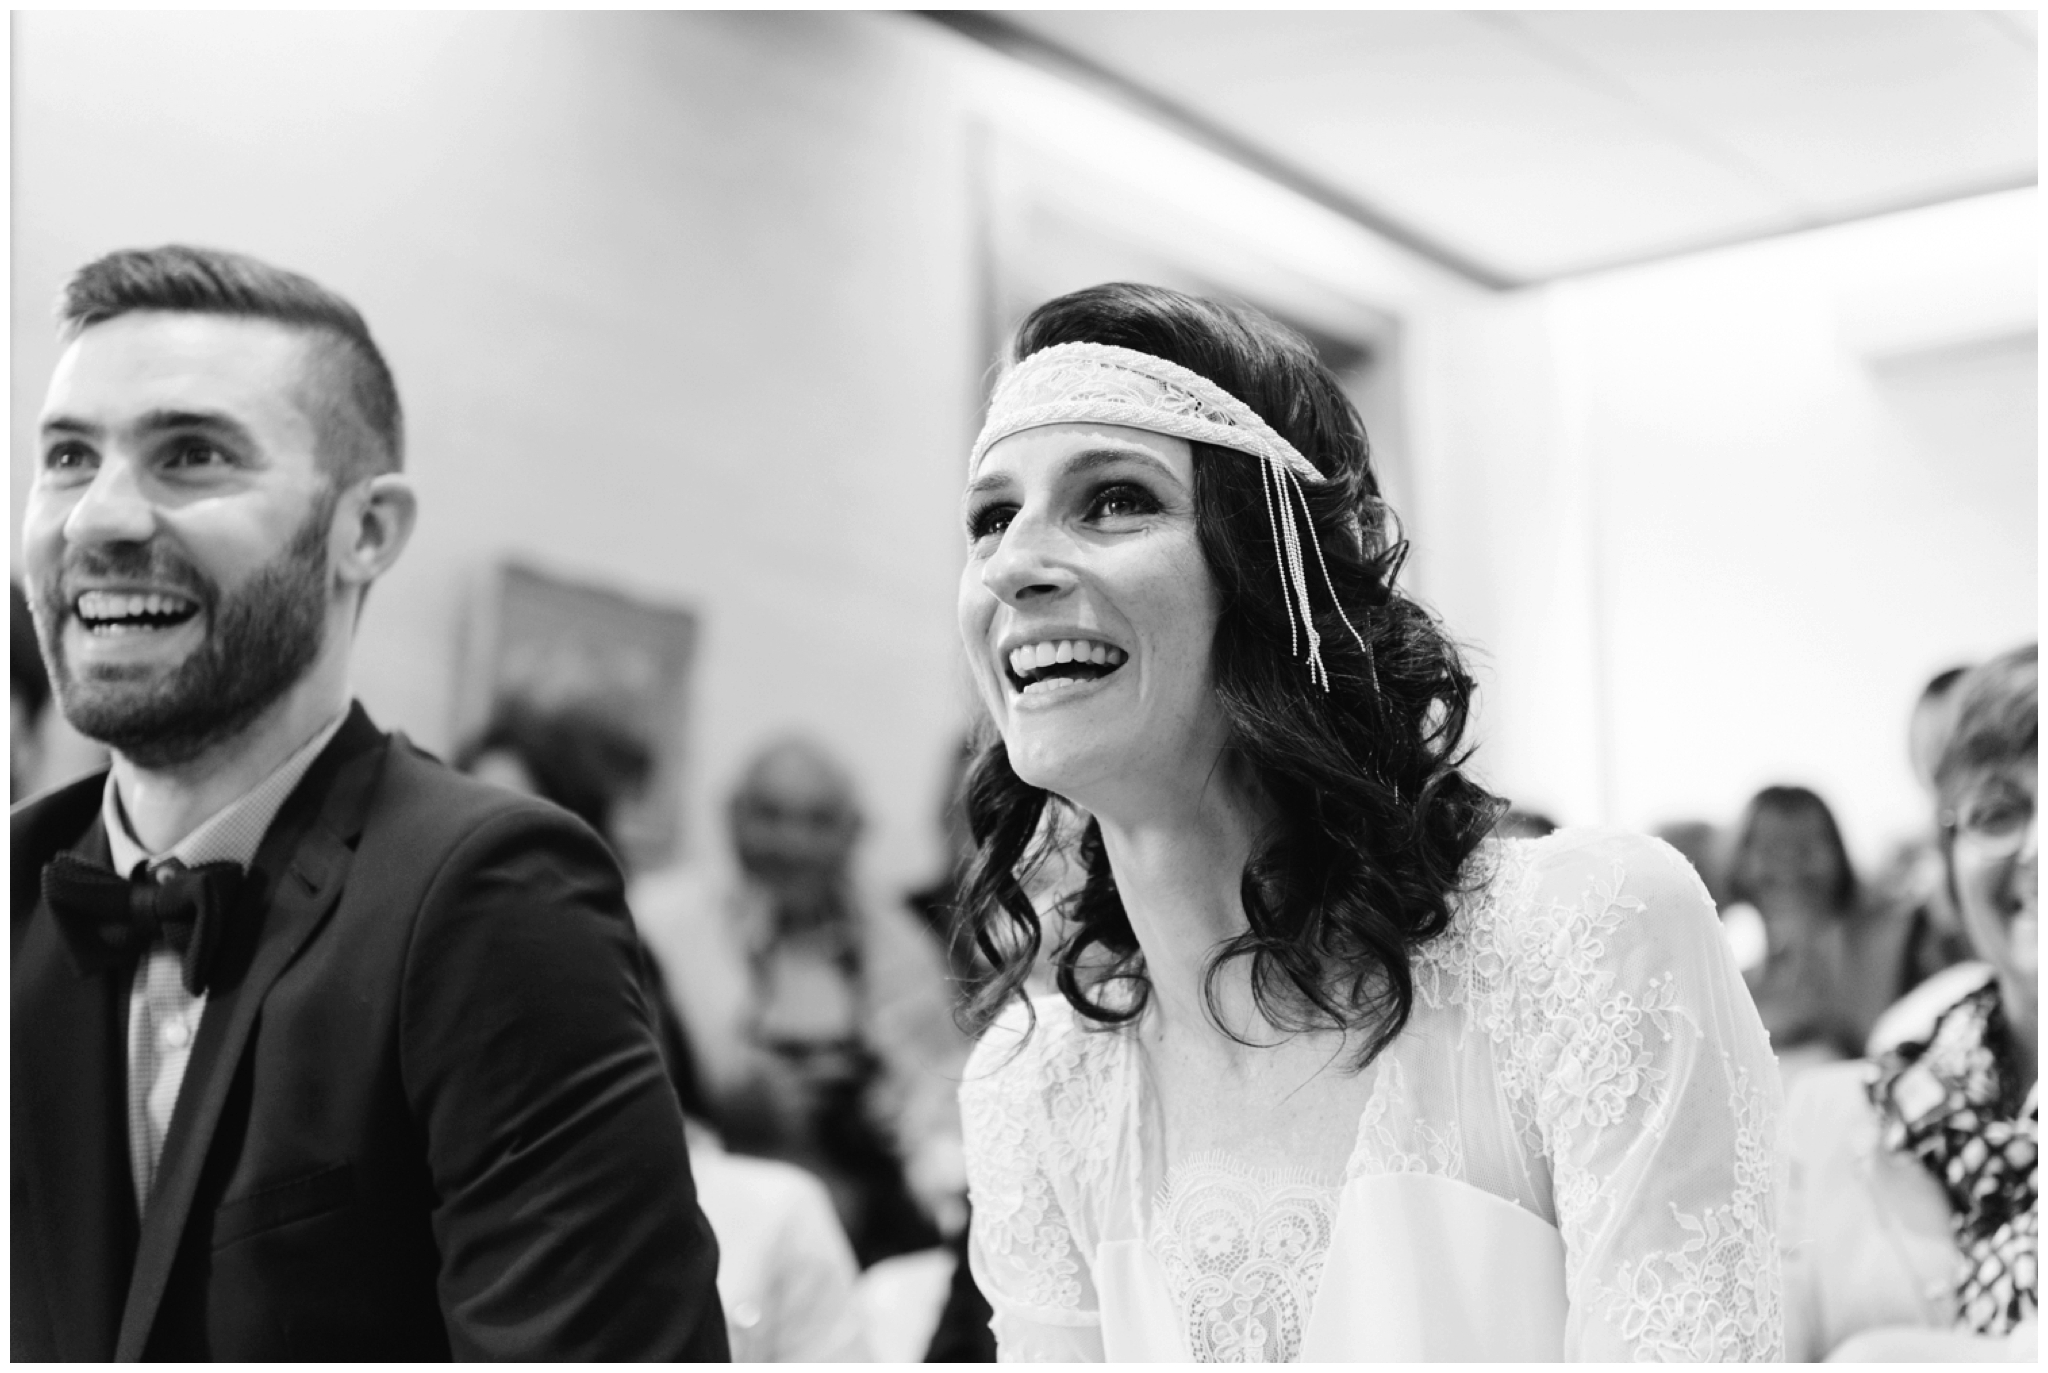 photographe-mariage-montagne-vercors-boho-folk-grenoble-annecy-alpes_0042